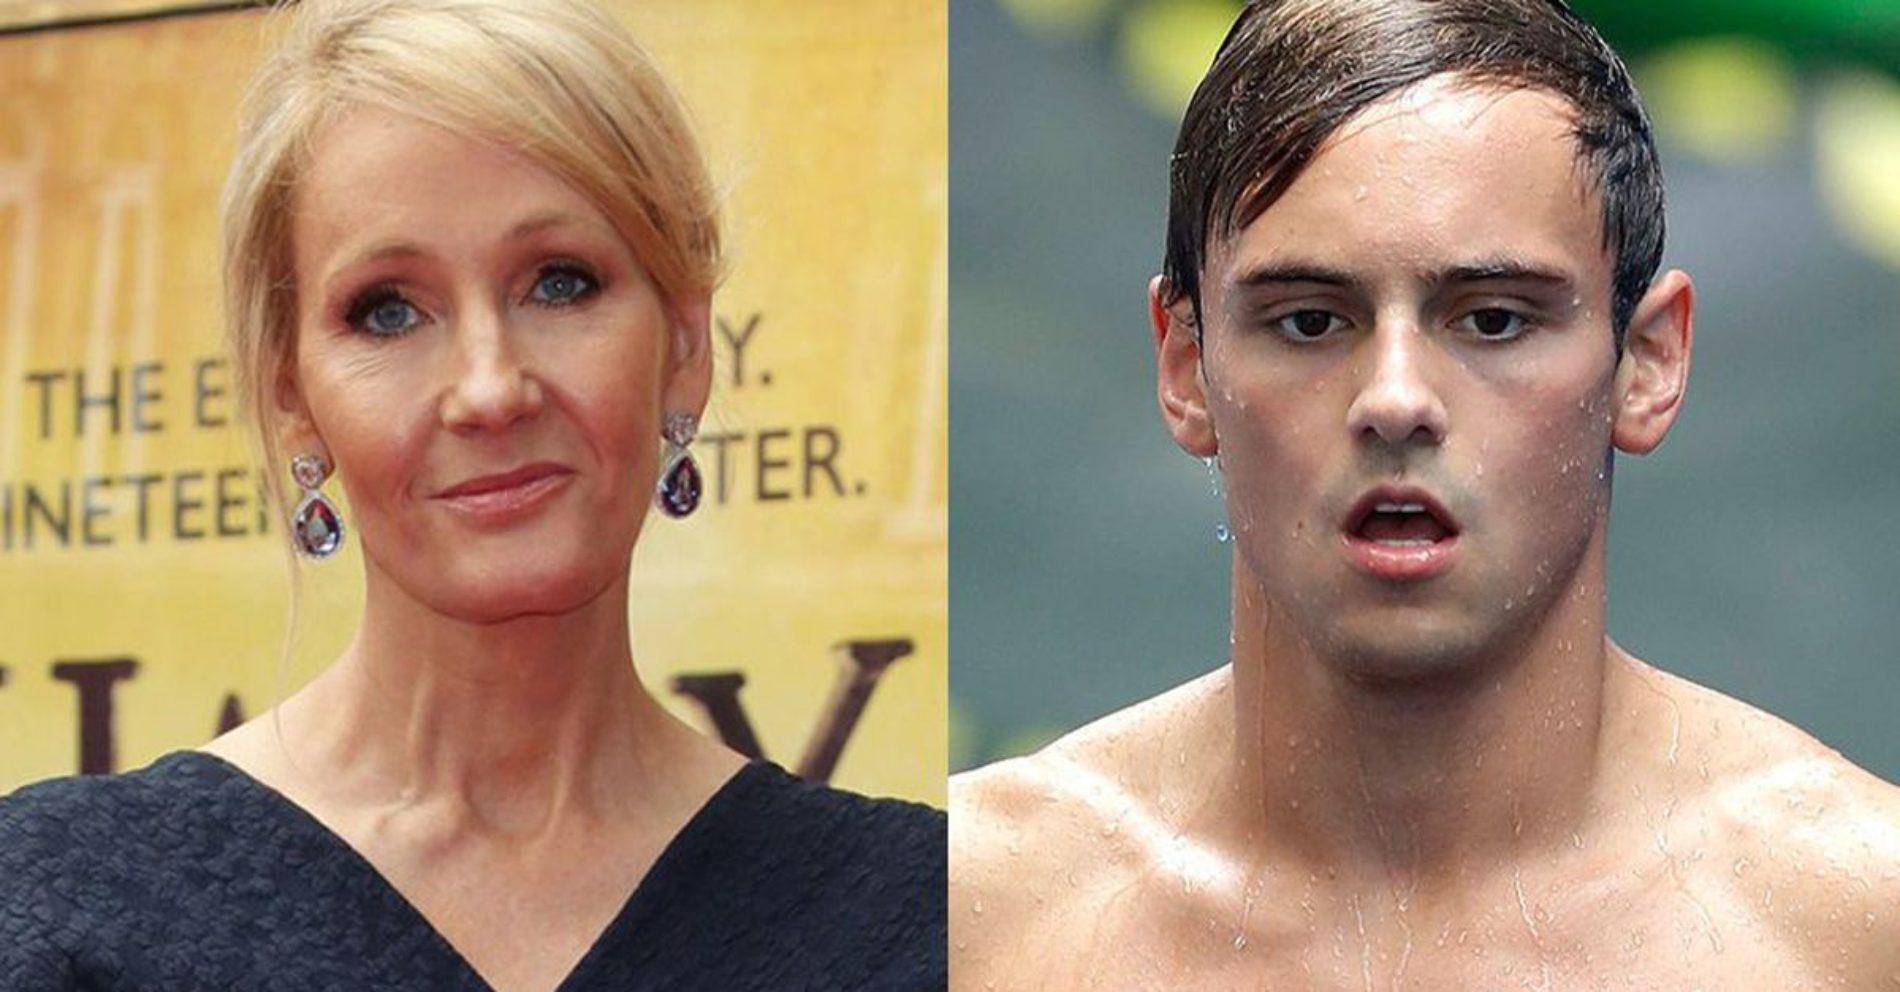 J.K. Rowling shuts down homophobic tweet trolling Tom Daley following his Olympic exit